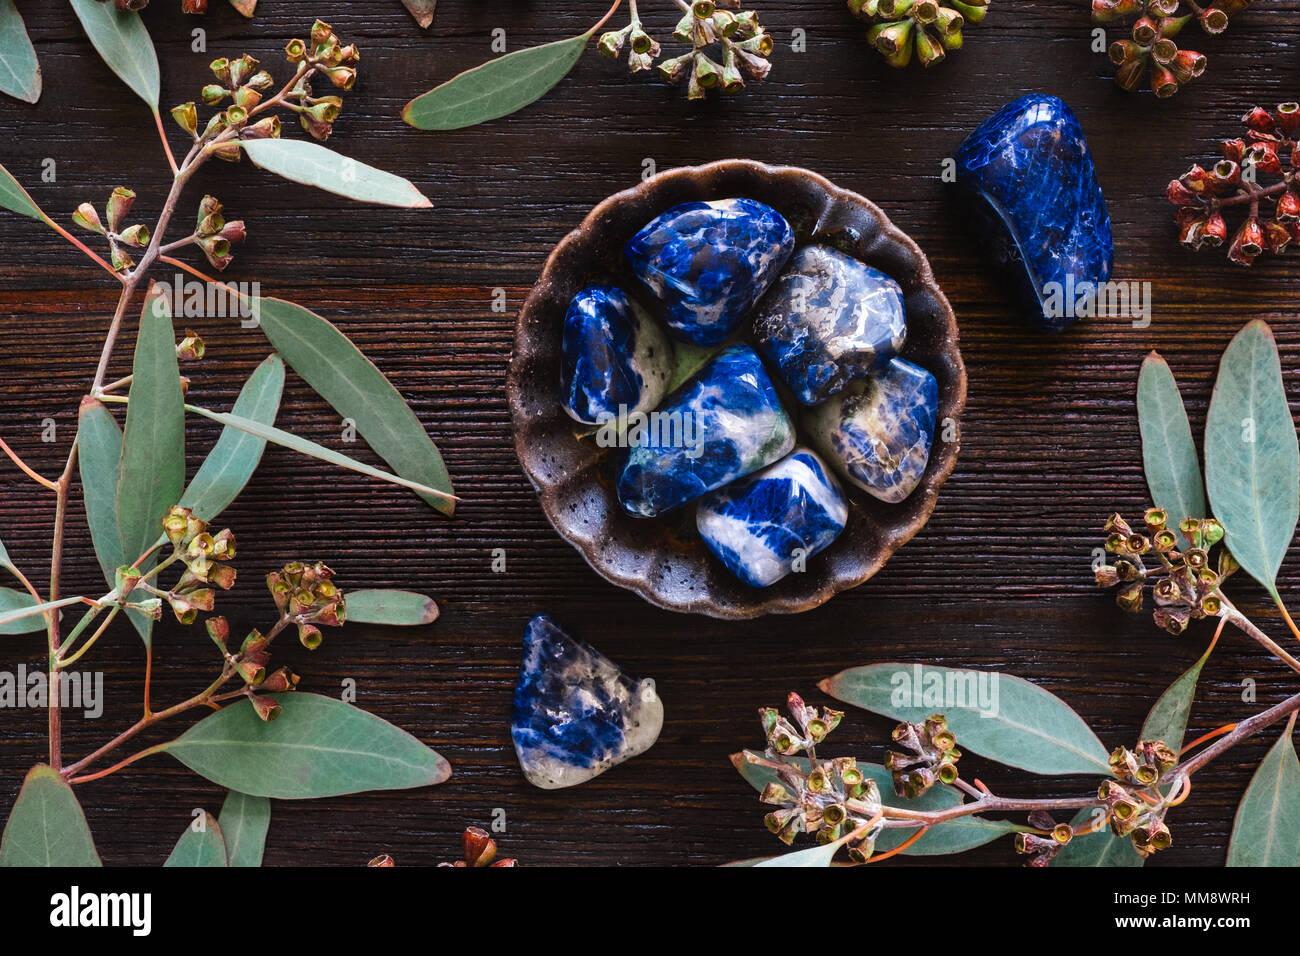 Ceramic Bowl of Sodalite on Dark Table with Eucalyptus. Stock Photo